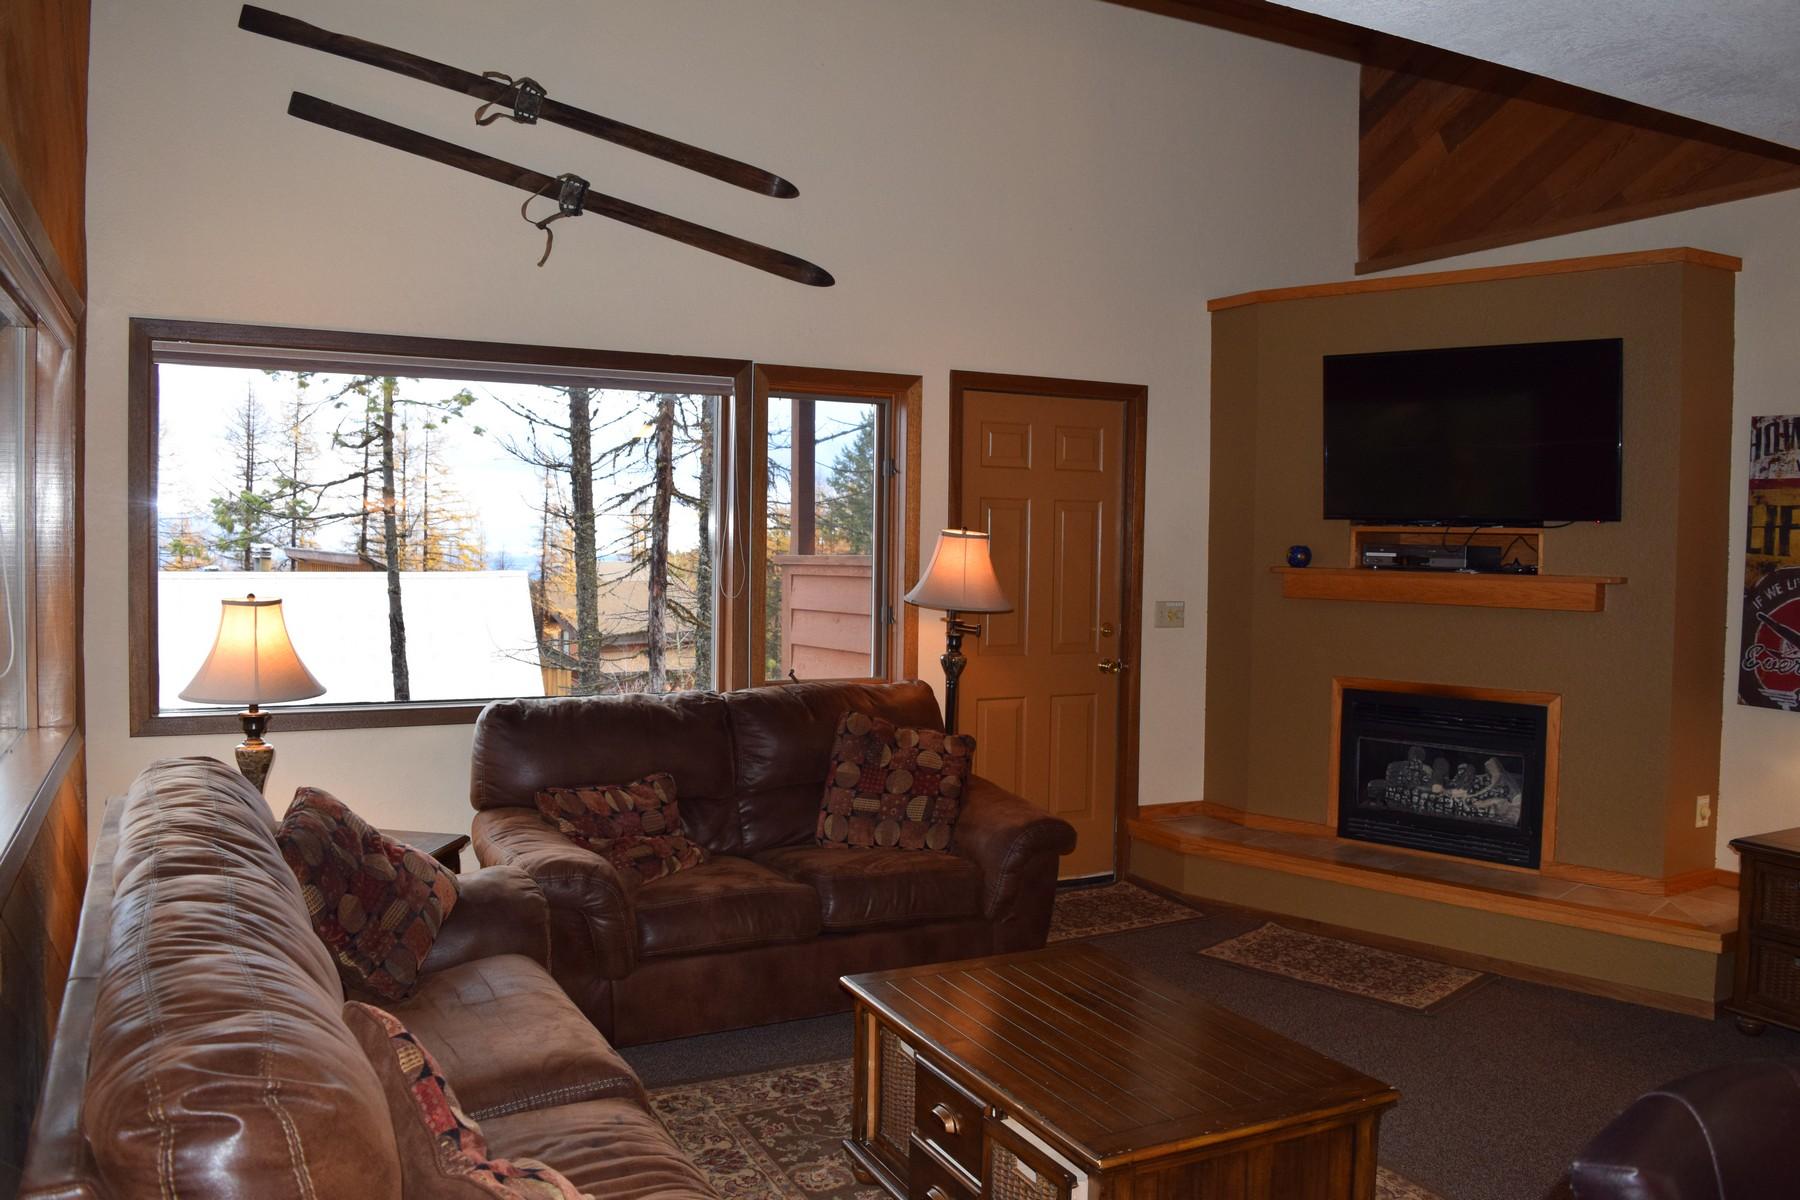 Additional photo for property listing at 3858 Winter Lane, Lotus C3, Whitefish, MT 59937 3858  Winter Ln Lotus C3 Whitefish, Montana 59937 United States